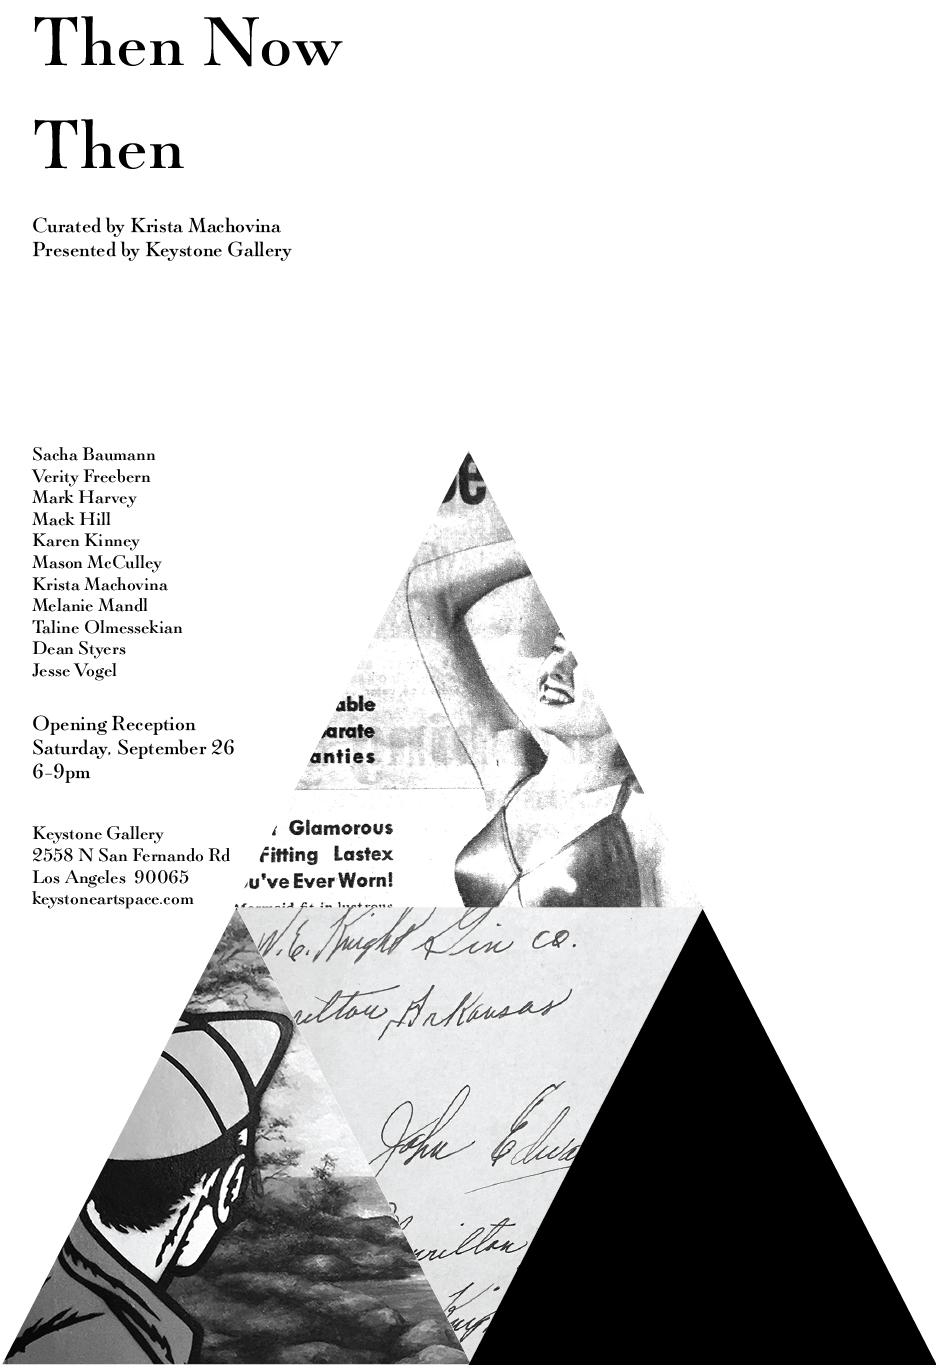 Keystone Gallery presents a group show featuring  Sacha Baumann , Verity Freebern , Mark Harvey , Mack Hill , Karen Kinney , Krista Machovina , Melanie Mandl , Taline Olmessekian , Dean Styers , Jesse Vogel